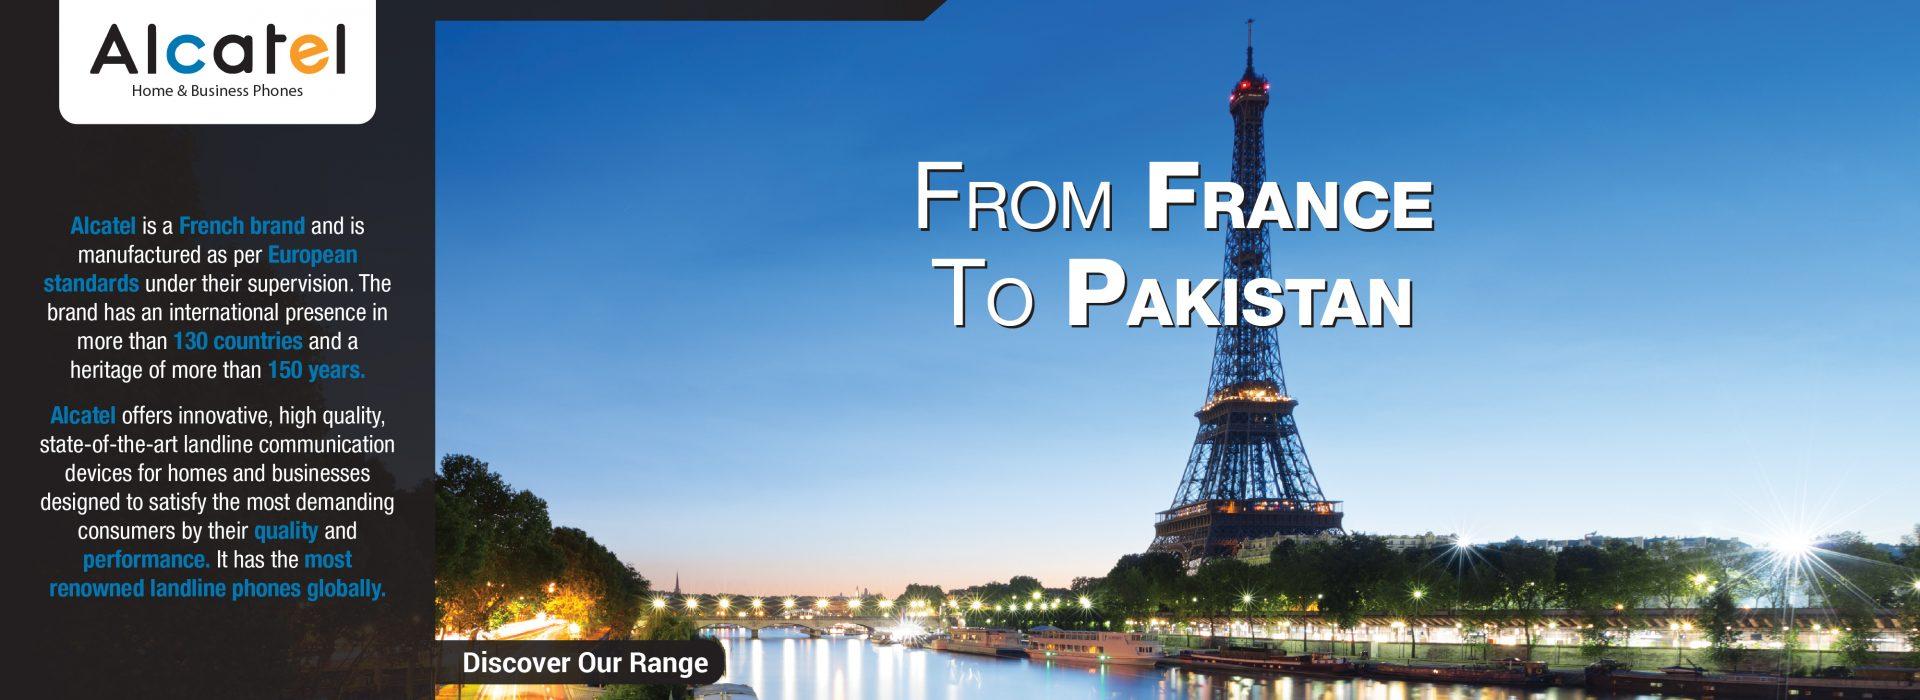 ALCATEL-Distributor-Home-Business-Phones-Pakistan-12